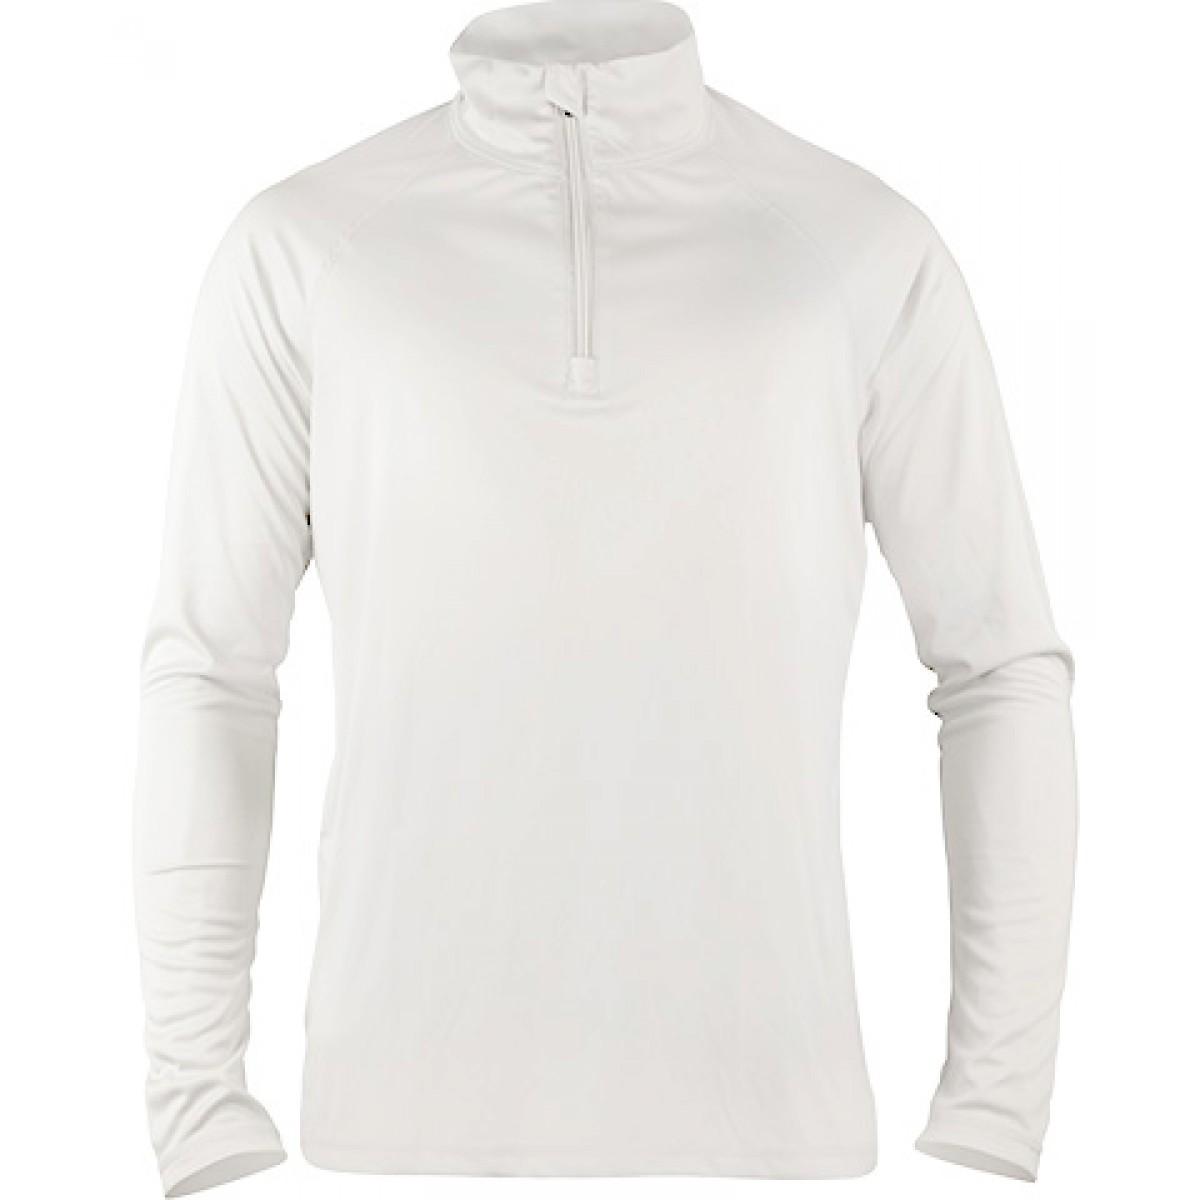 Quarter-Zip Lightweight Pullover-White-YL